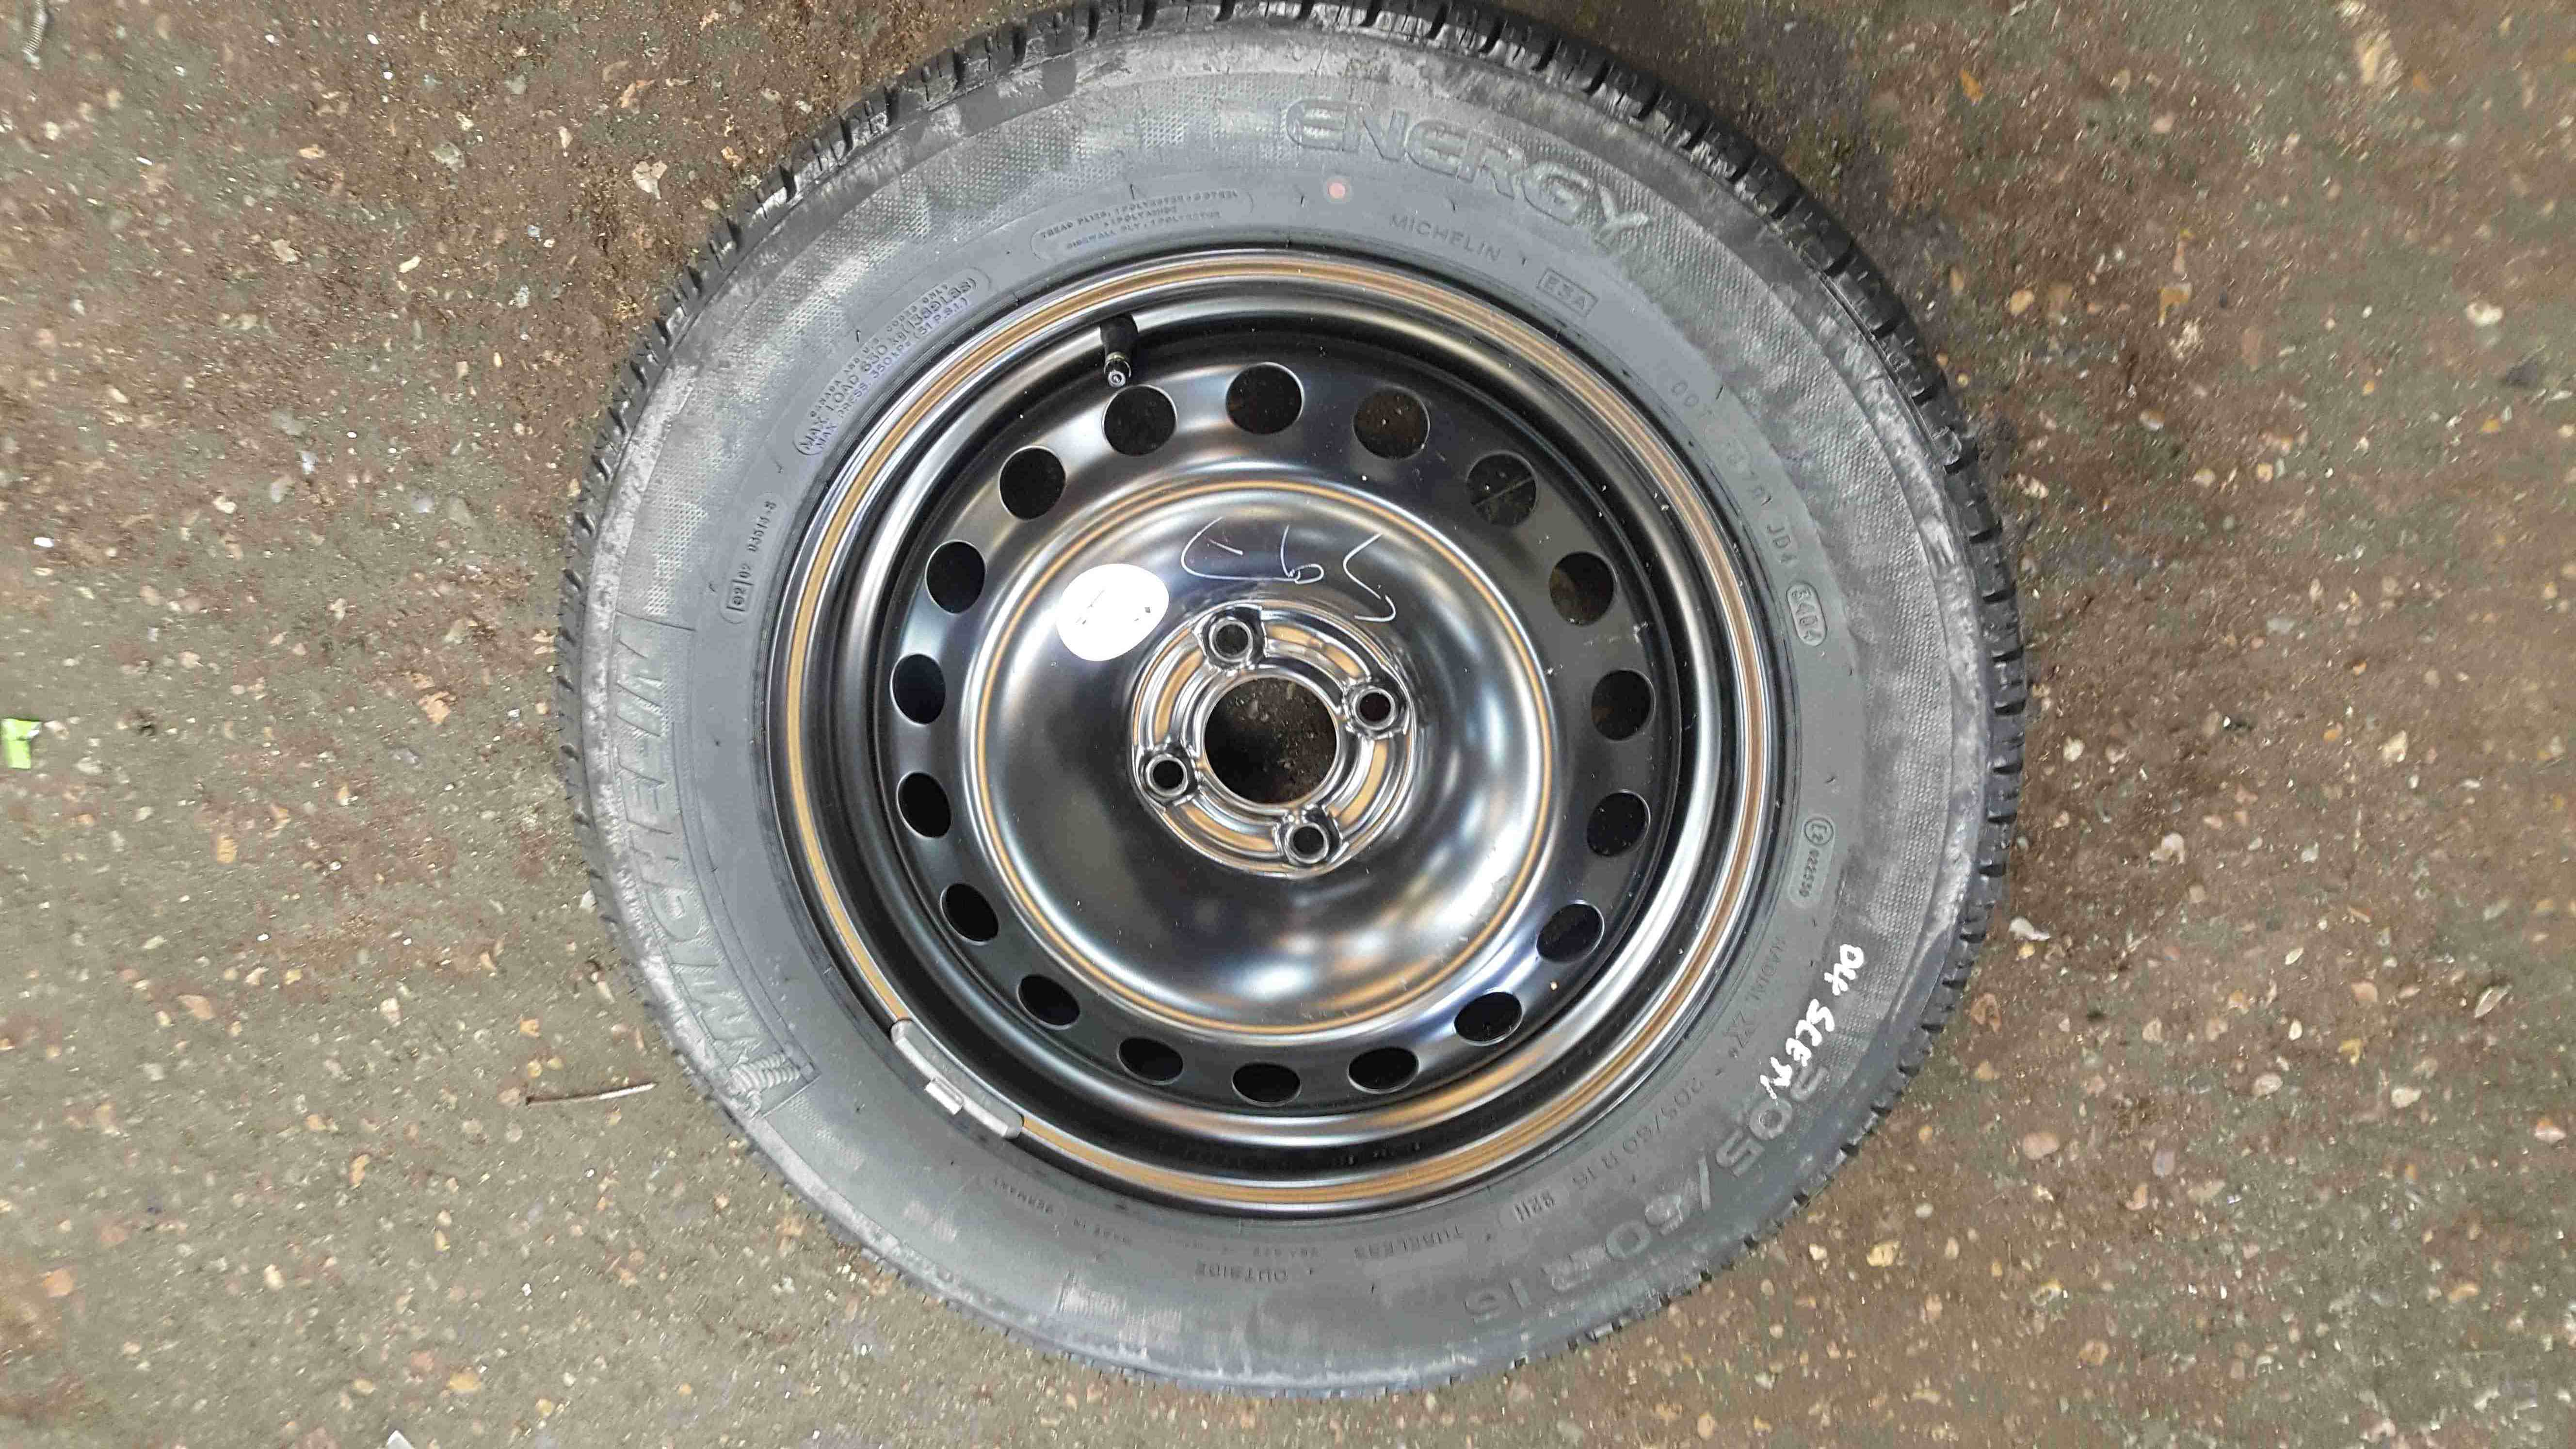 Renault Scenic MK2 2003-2009 Steel Wheel Rim  Tyre 205 60 16 7mm